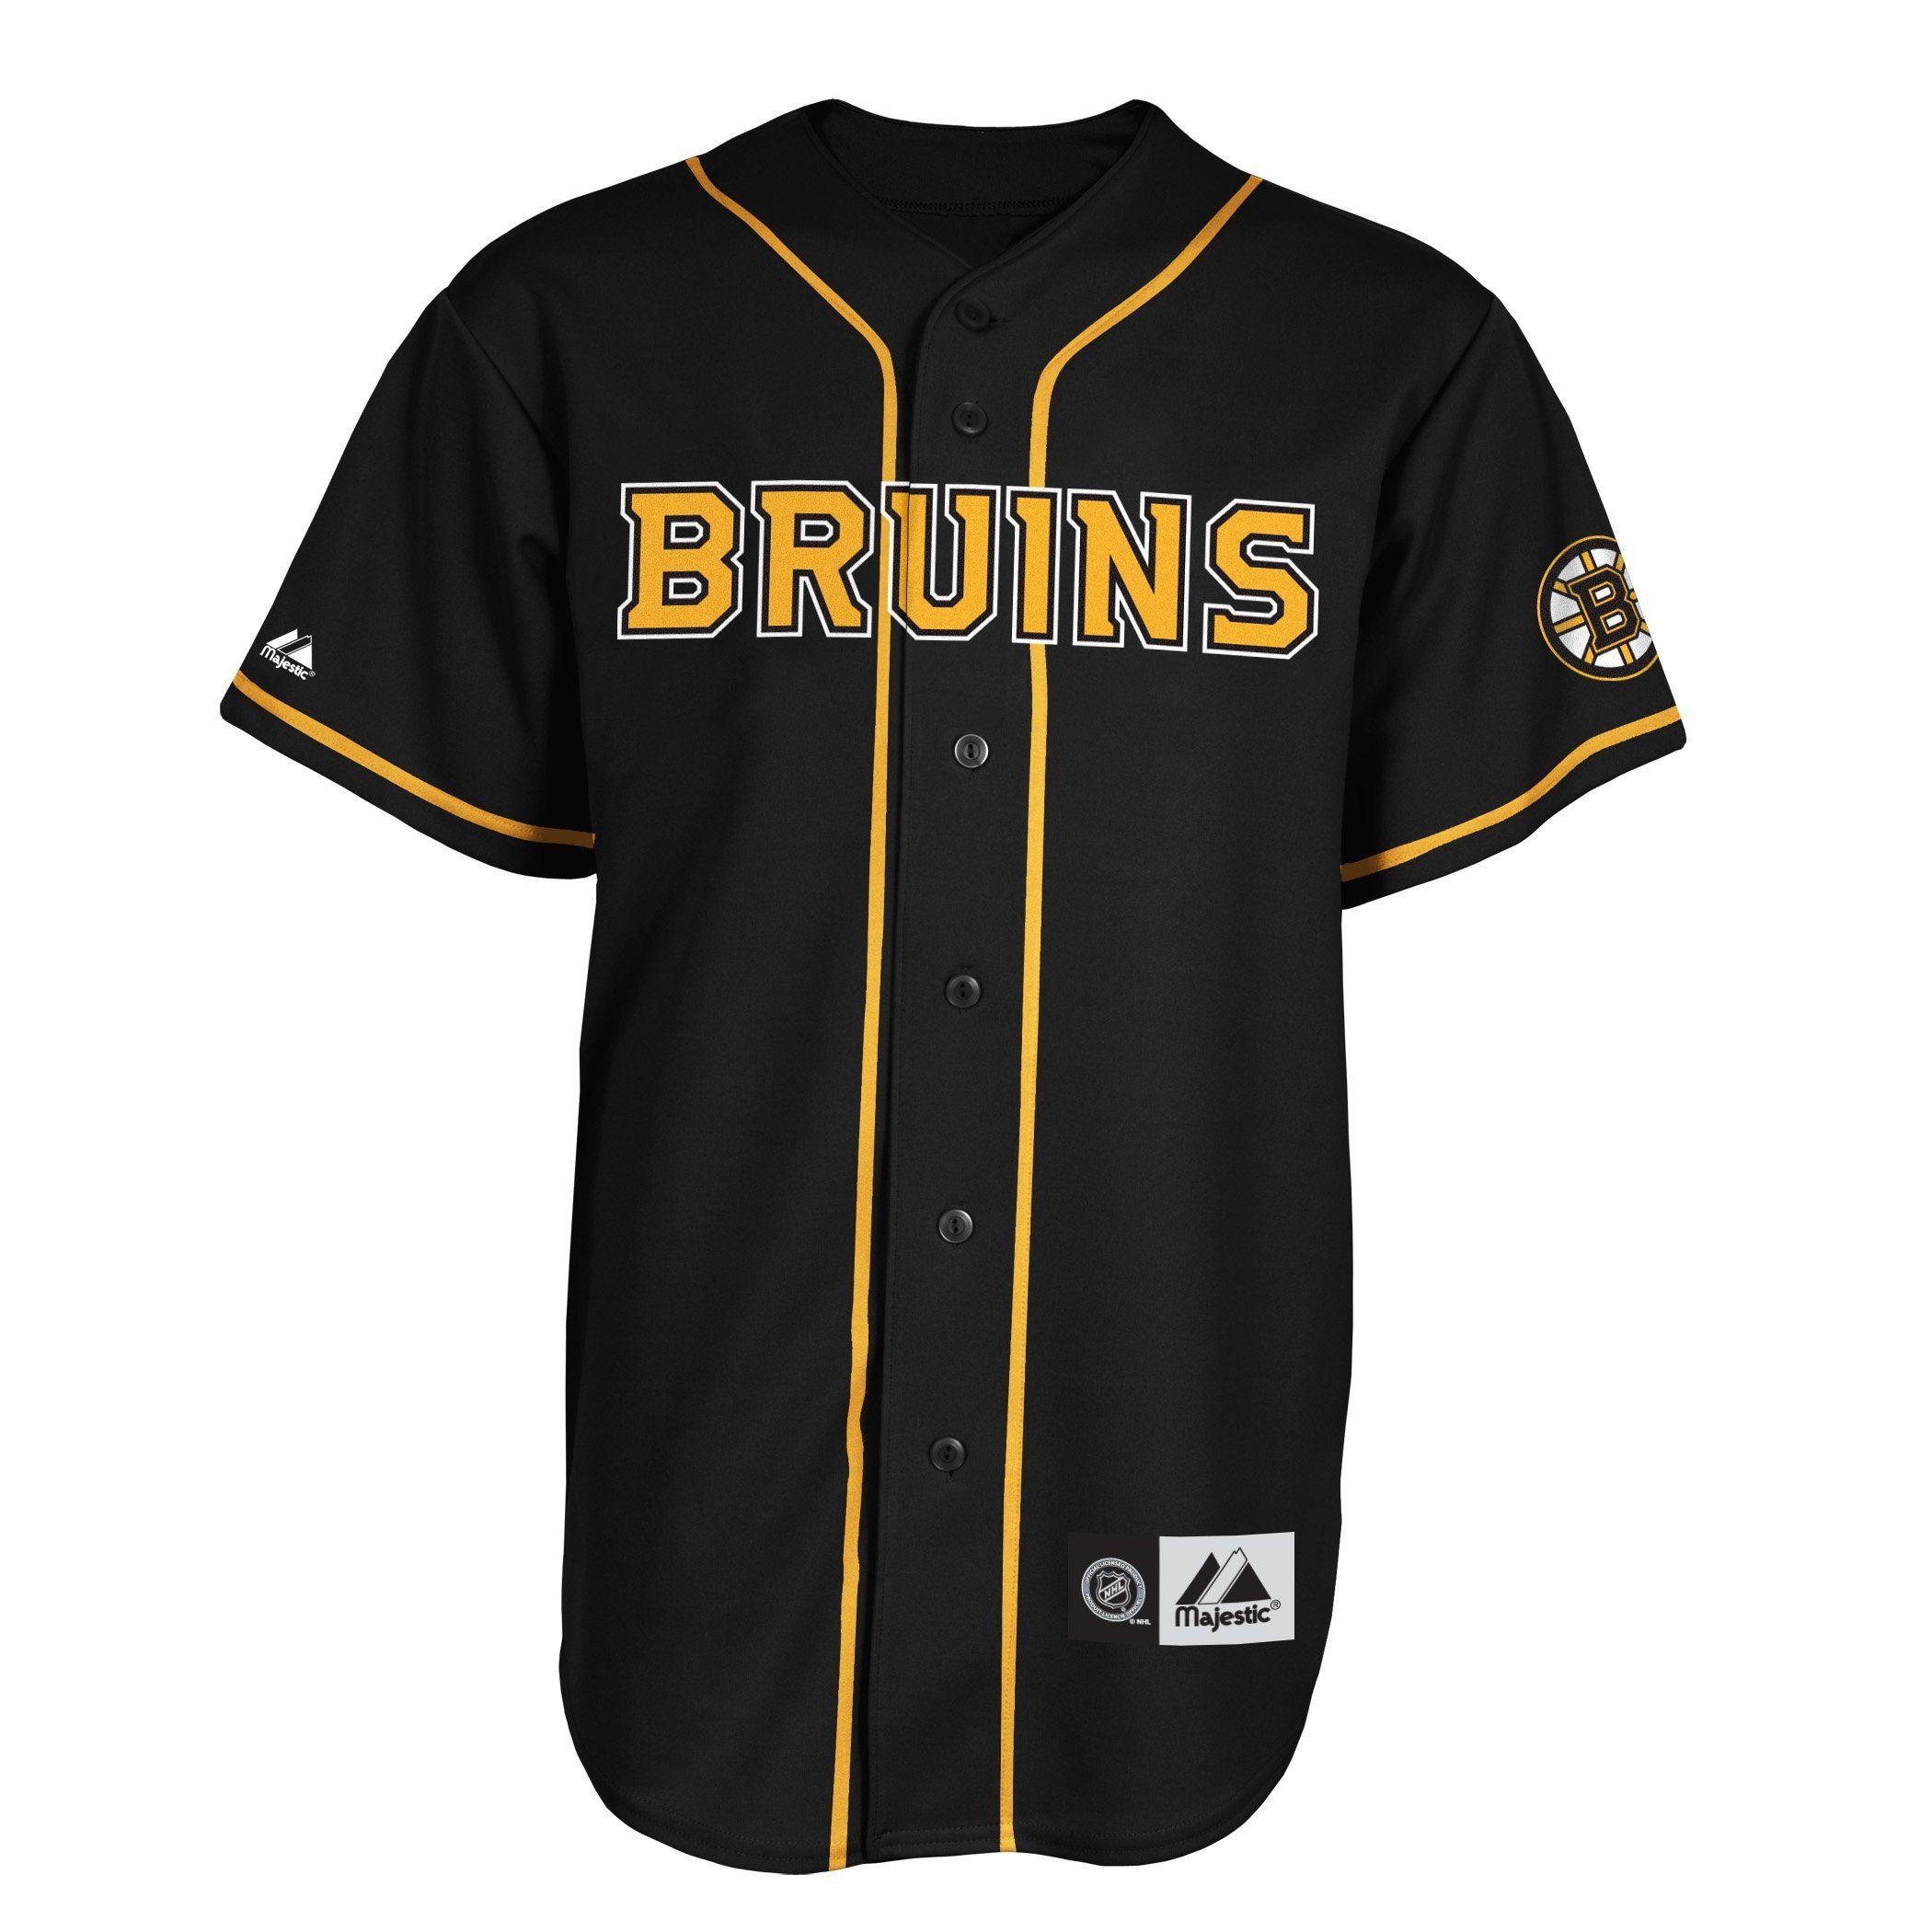 6d99be93e NHL Men's Boston Bruins Short Sleeve Button Front Replica Jersey (Pro  Black/Pro Light Gold, XX-Large)